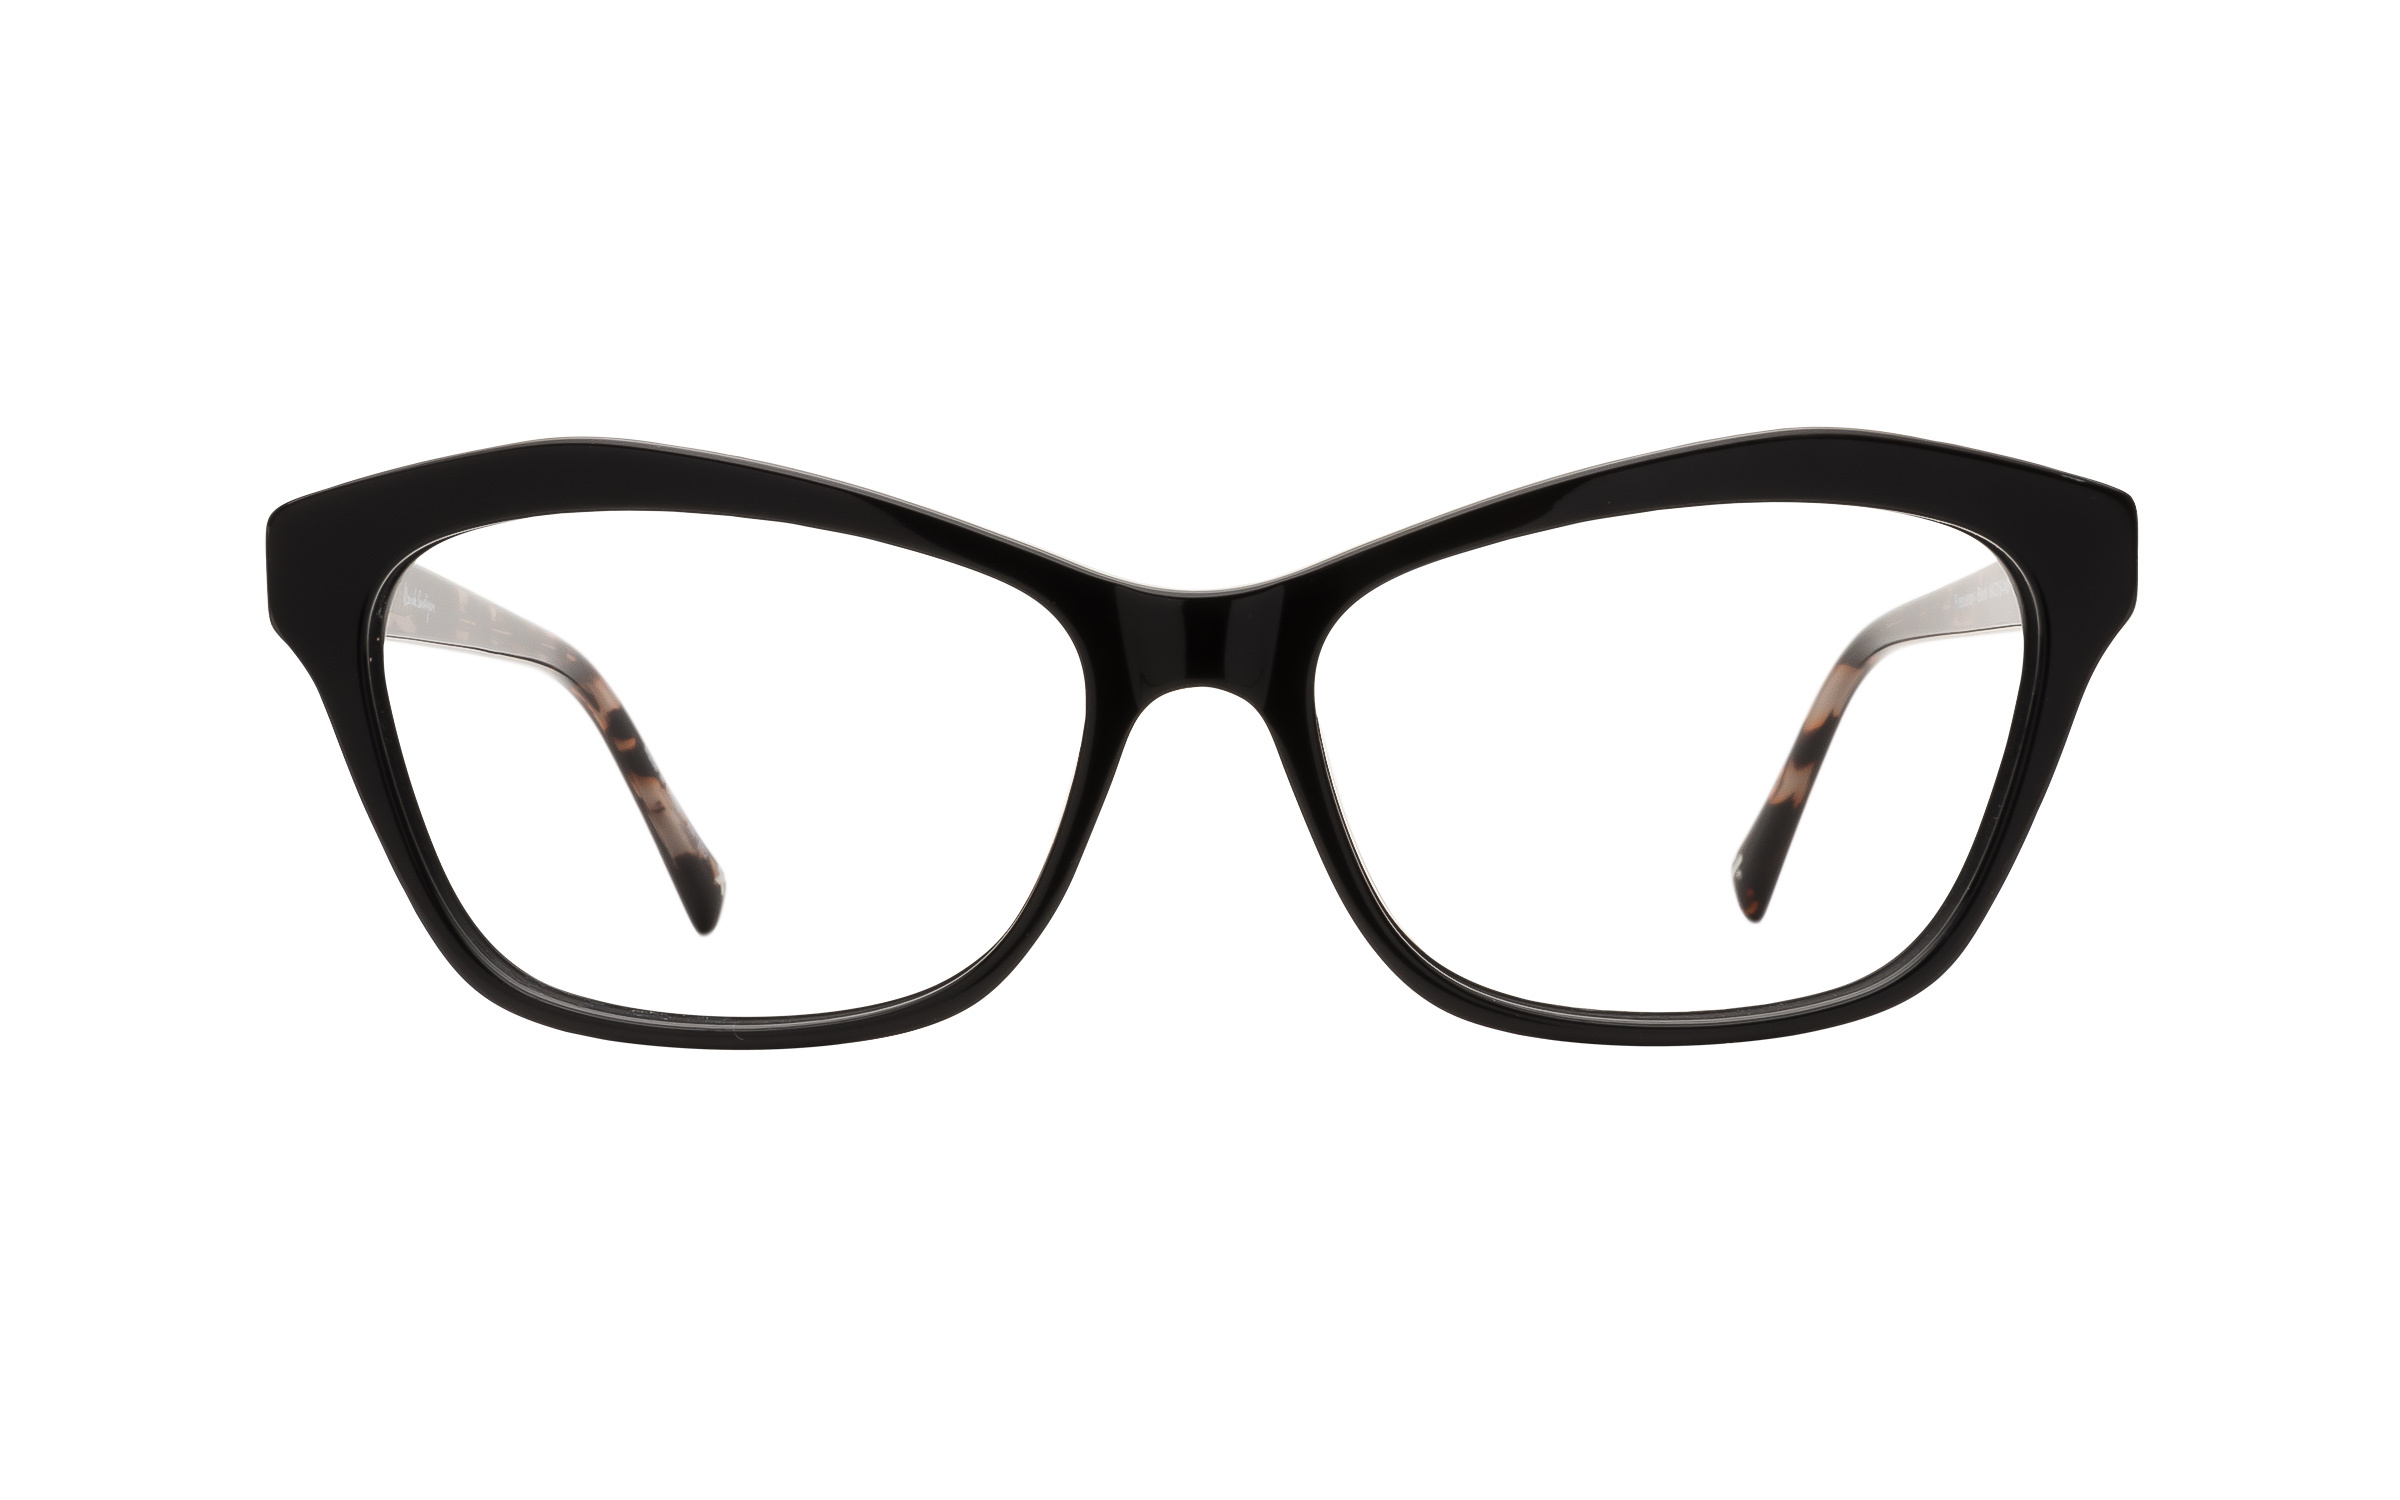 Derek_Cardigan_Womens_Glasses_CatEye_Black_Online_Coastal